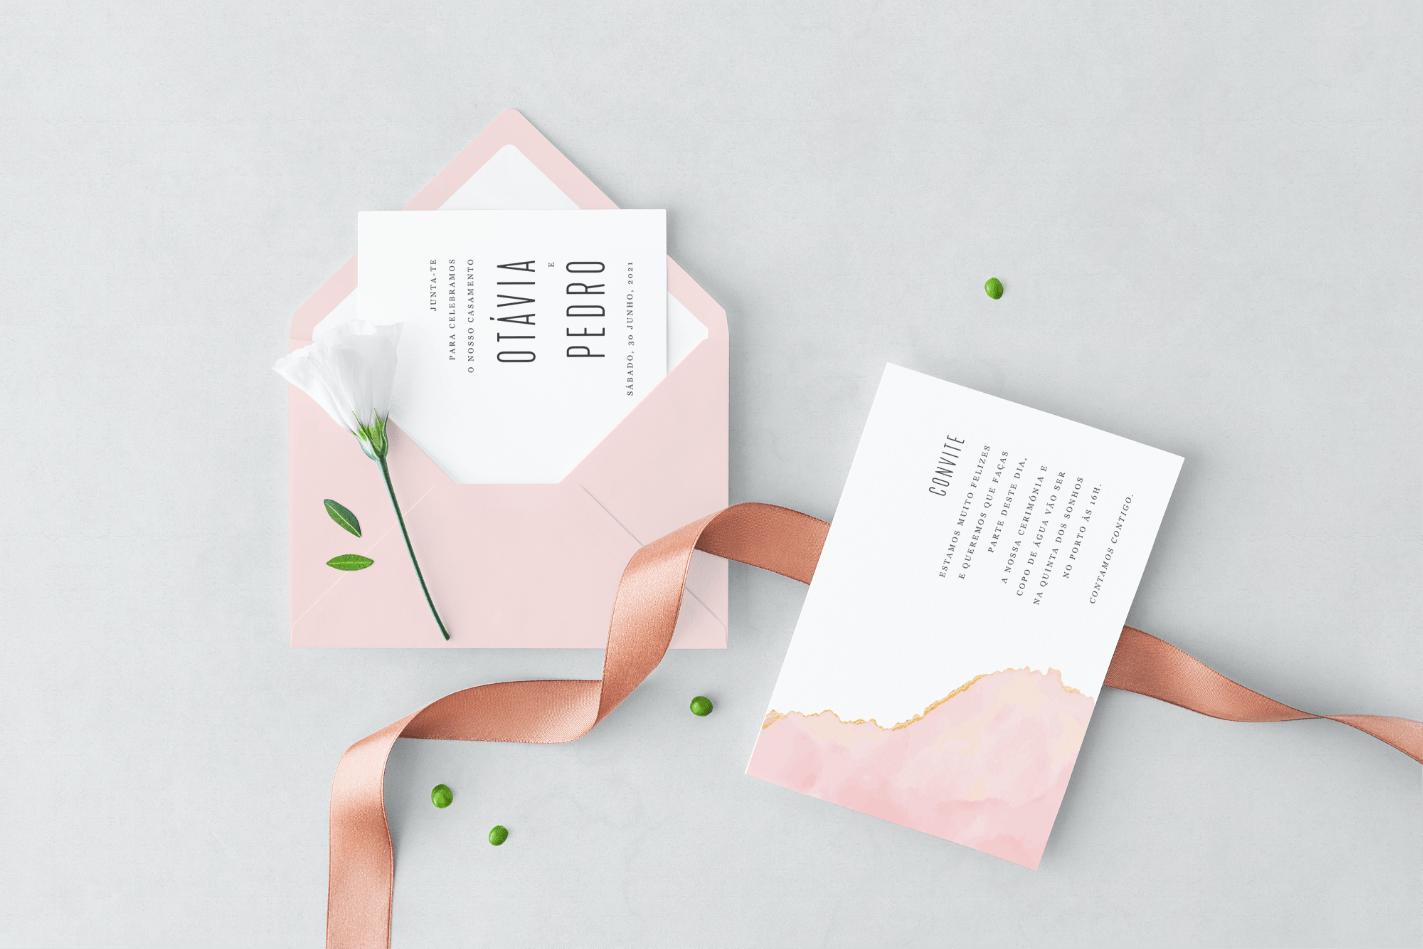 Convite de casamento branco com envelope cor de rosa